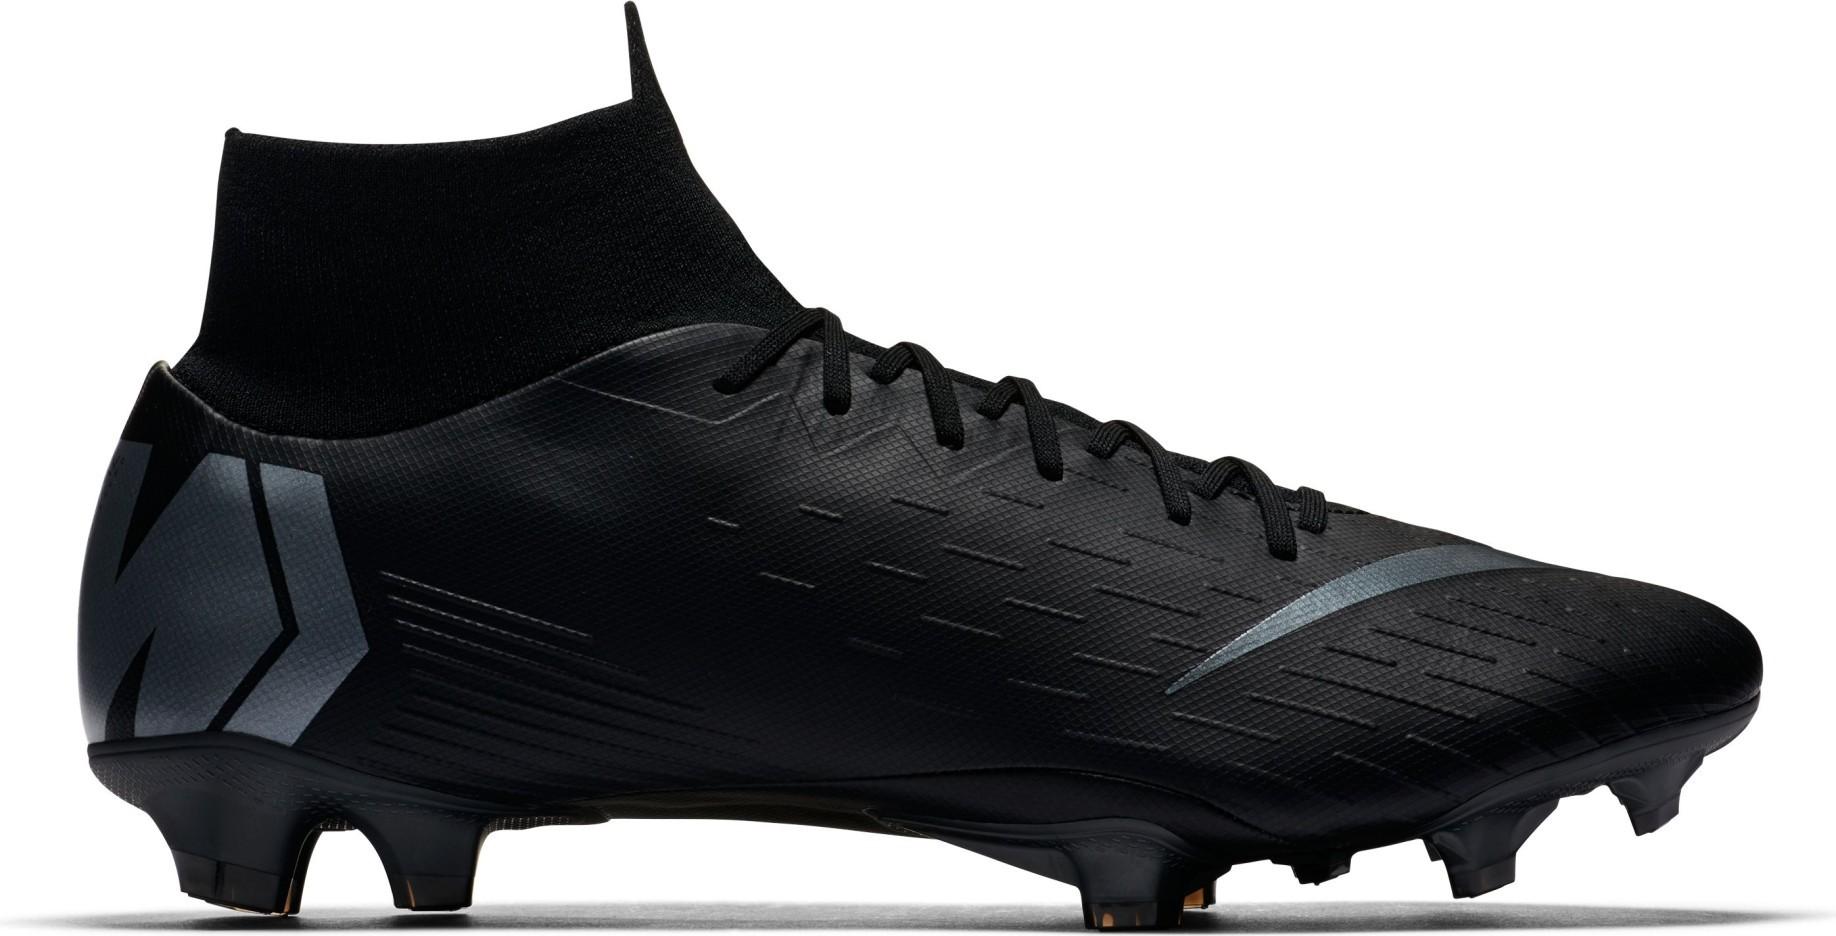 4e6240bd9428 Soccer shoes Nike Mercurial Superfly VI Pro FG Stealth OPS Pack colore Black  - Nike - SportIT.com